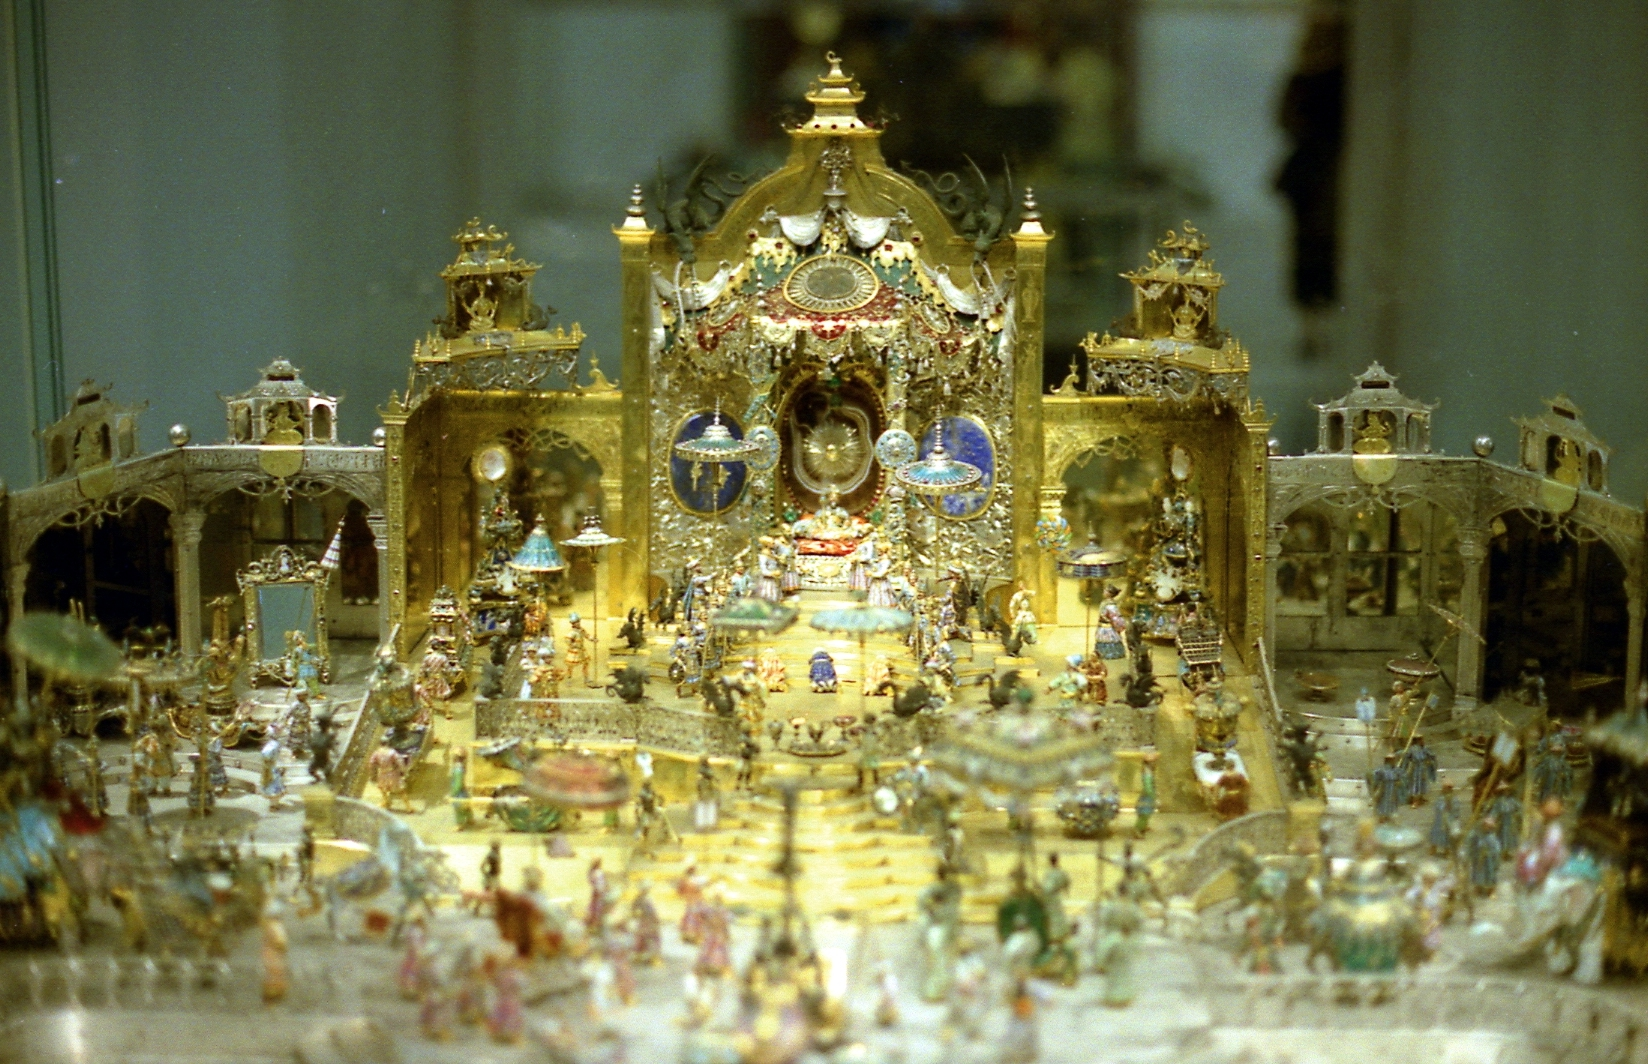 Hofstaat zu Delhi am Geburtstag des Großmoguls Aurangzeb, Johann Melchior Dinglinger (1701 bis 1708)